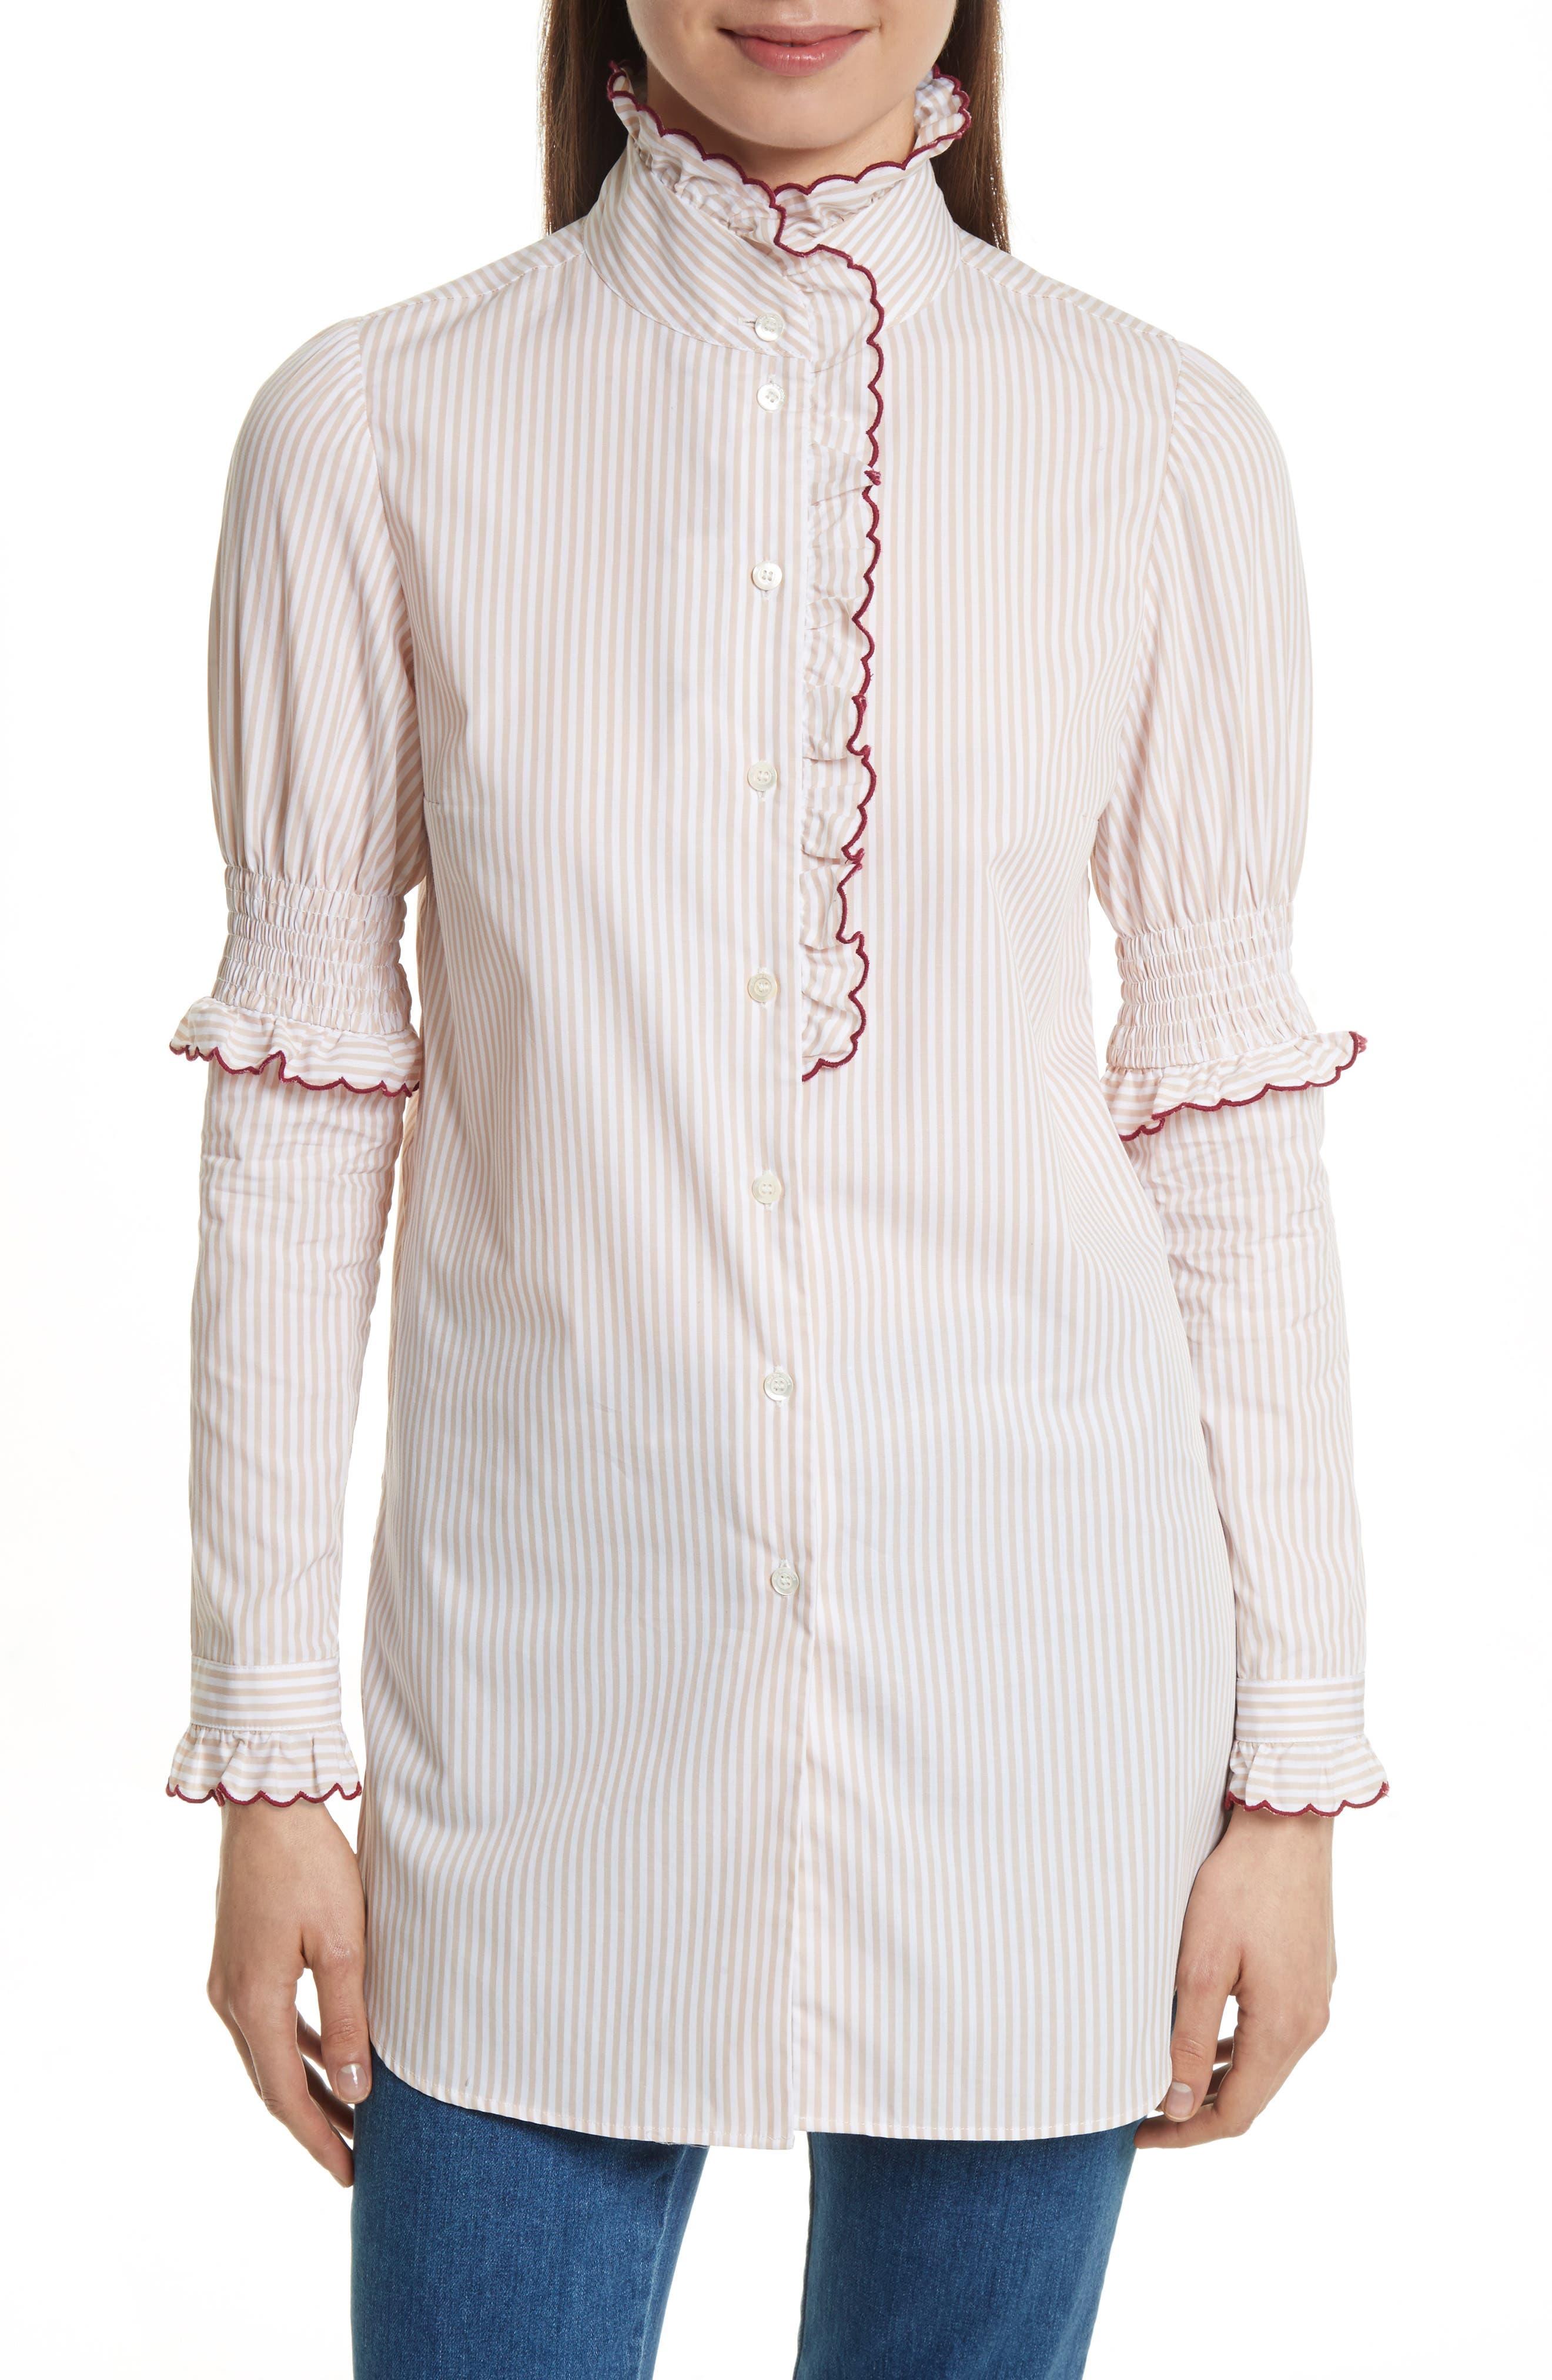 Main Image - See by Chloé Stripe Cotton Shirt